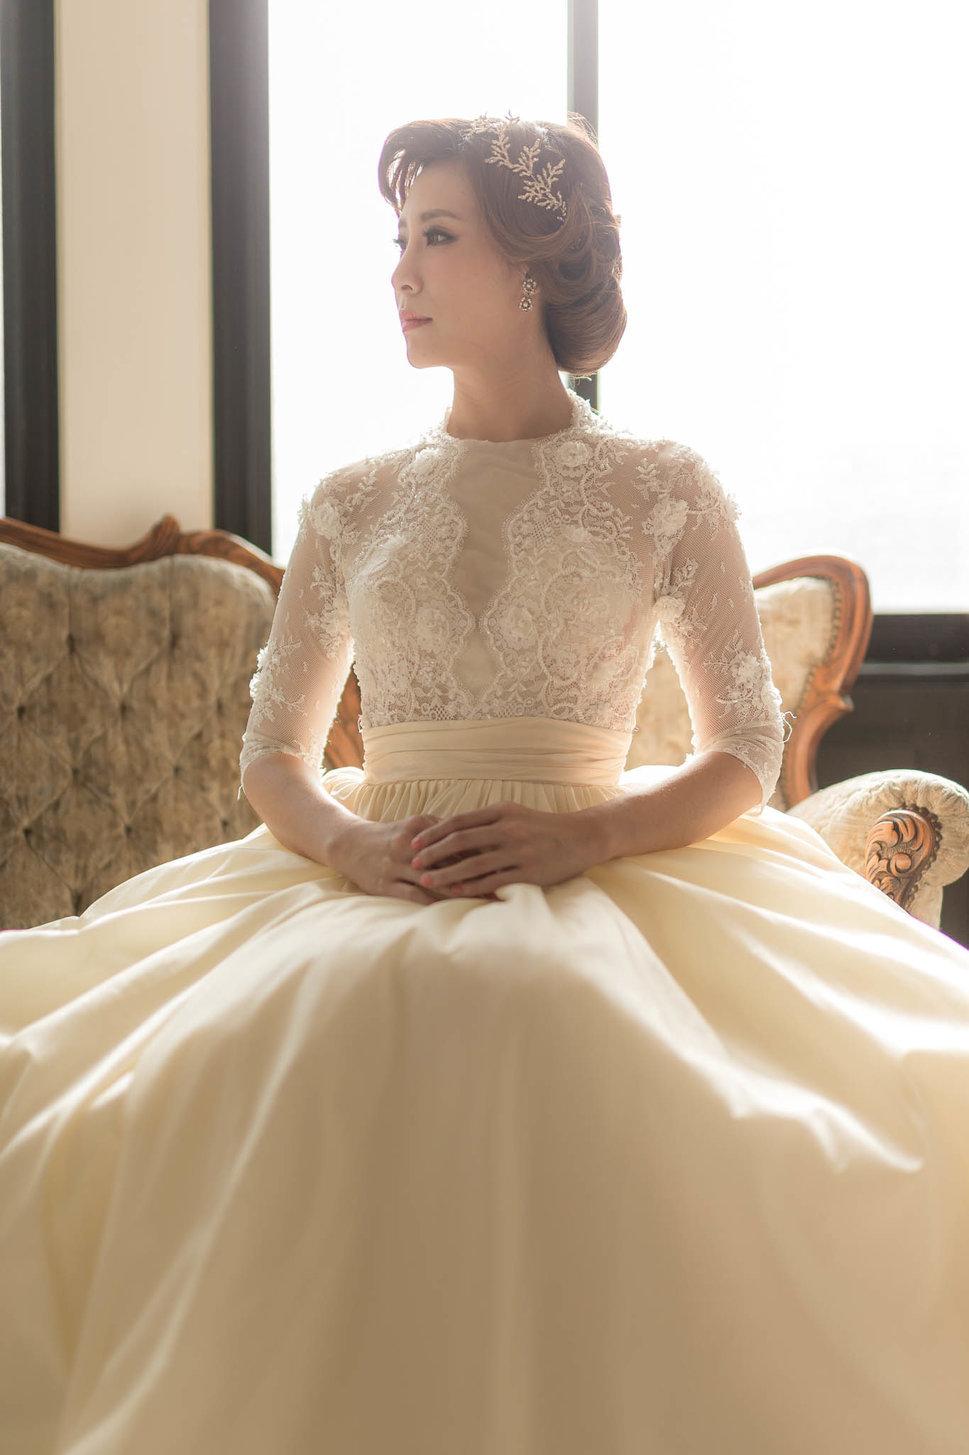 18PHOTO自主婚紗-潤兒(編號:406264) - 18 PHOTO 影像攝影工作室 - 結婚吧一站式婚禮服務平台